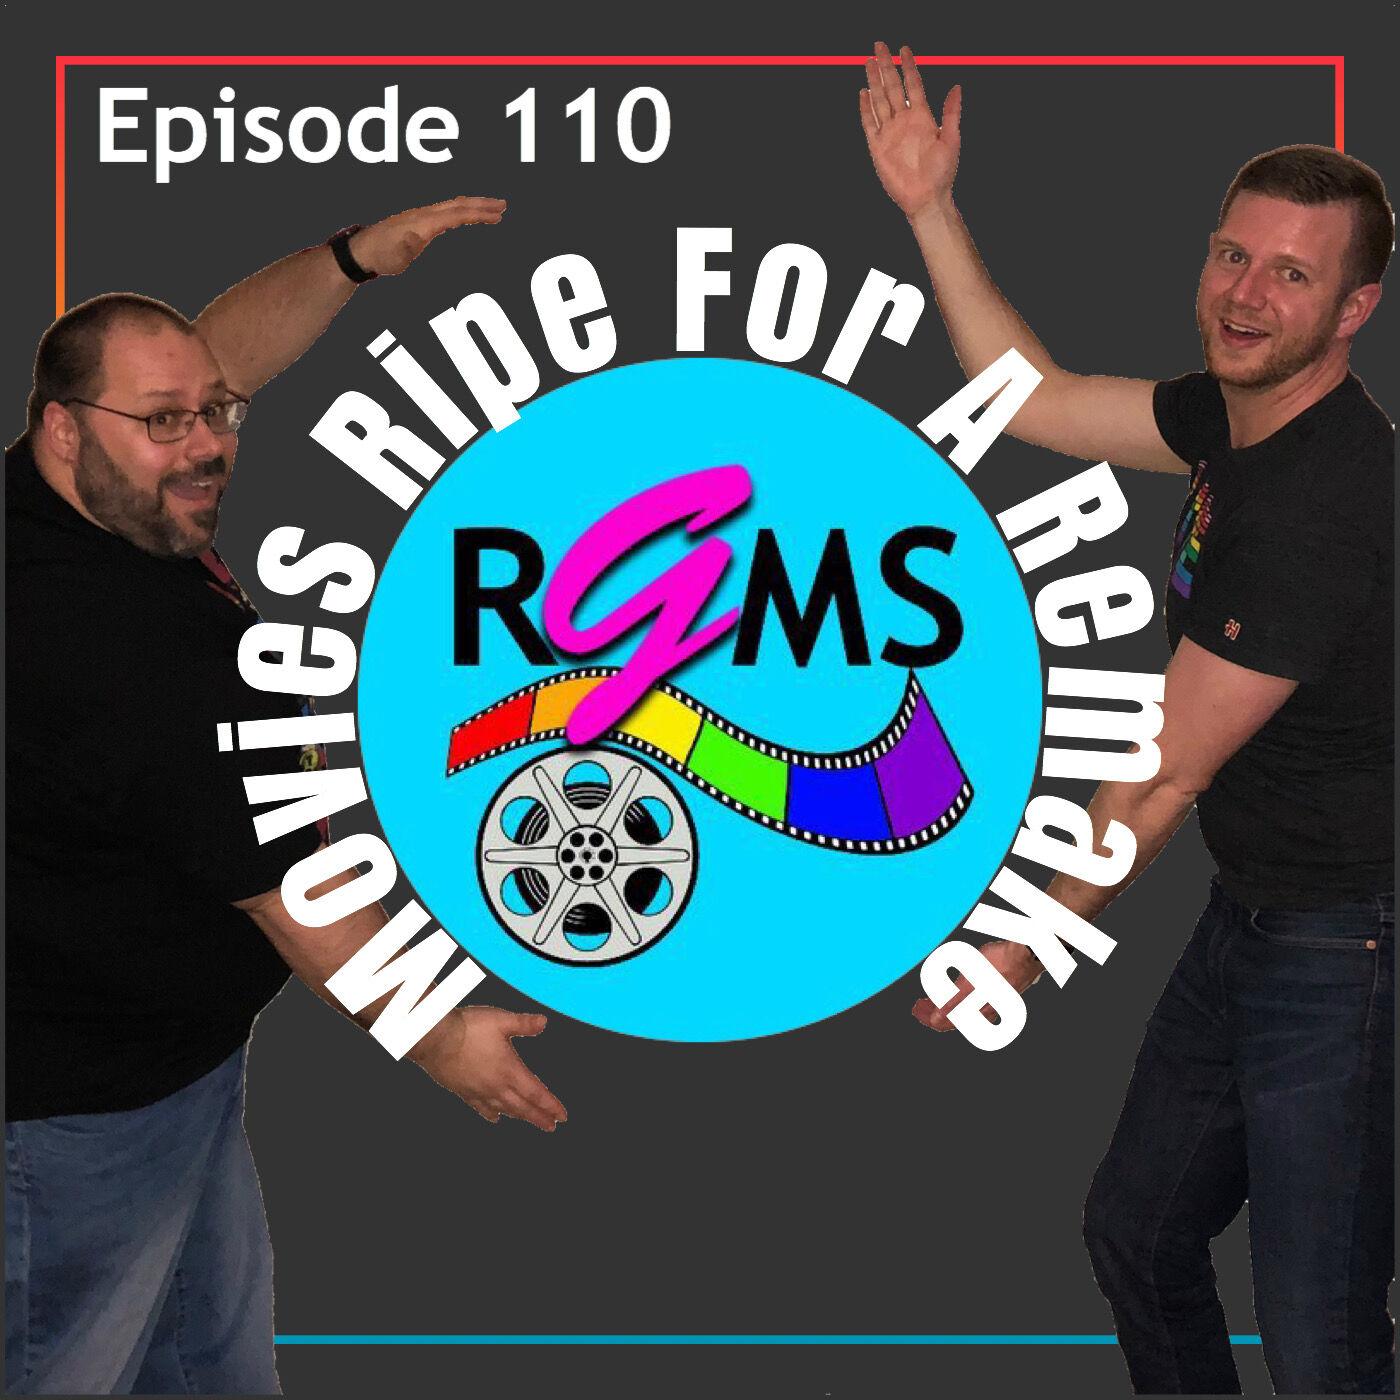 RGMS EP 110: Movies to Remake